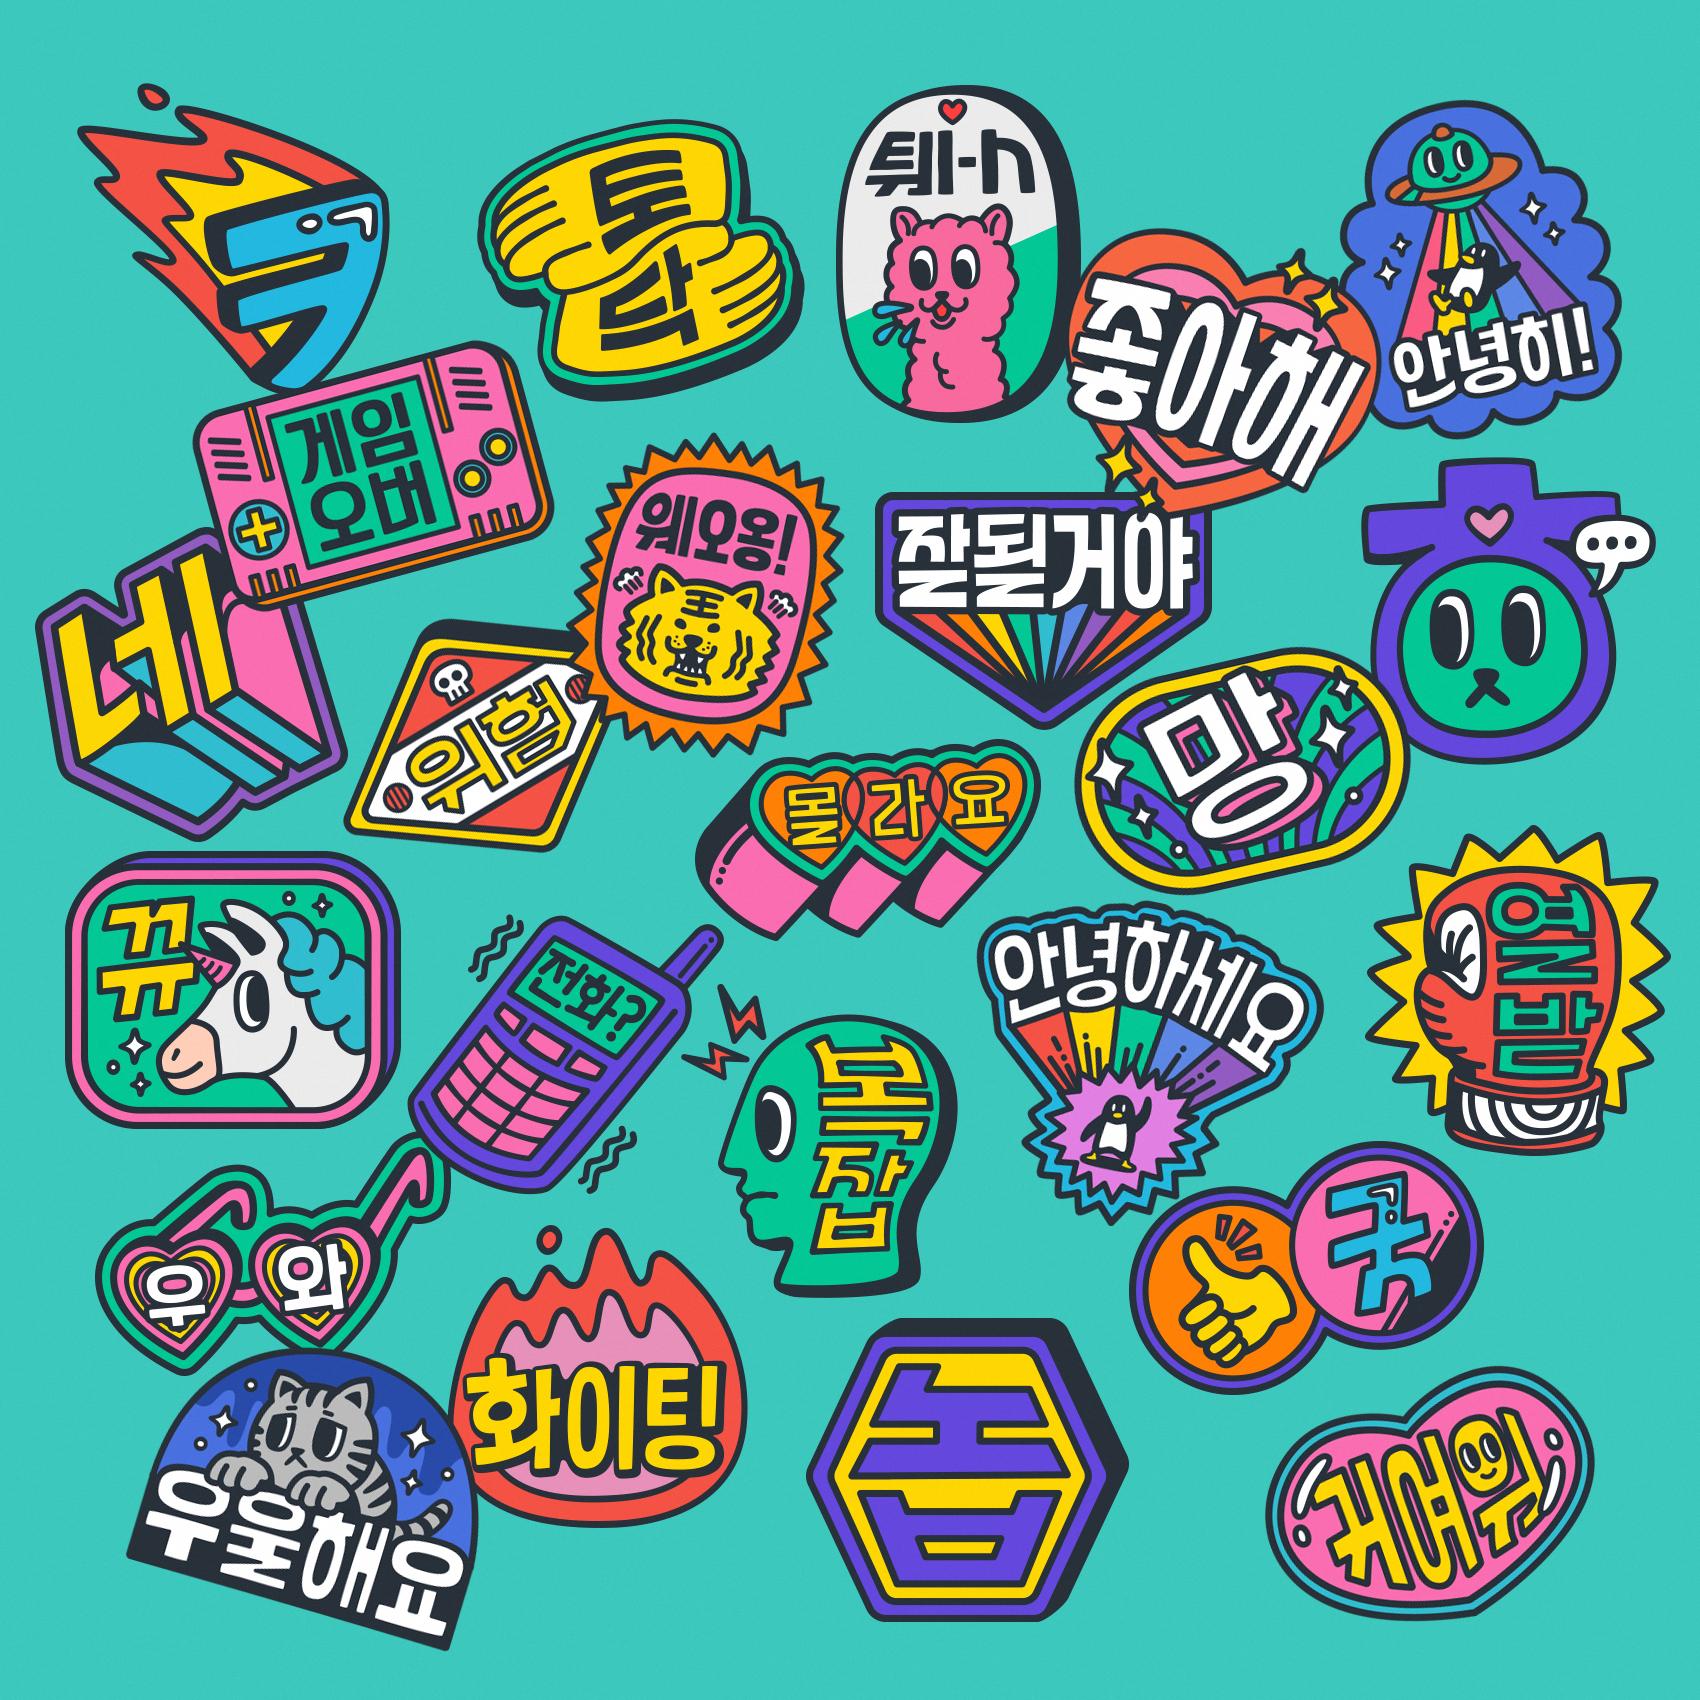 Sticker Pack INSTAGRAM(Giphy) in 2020 Illustration